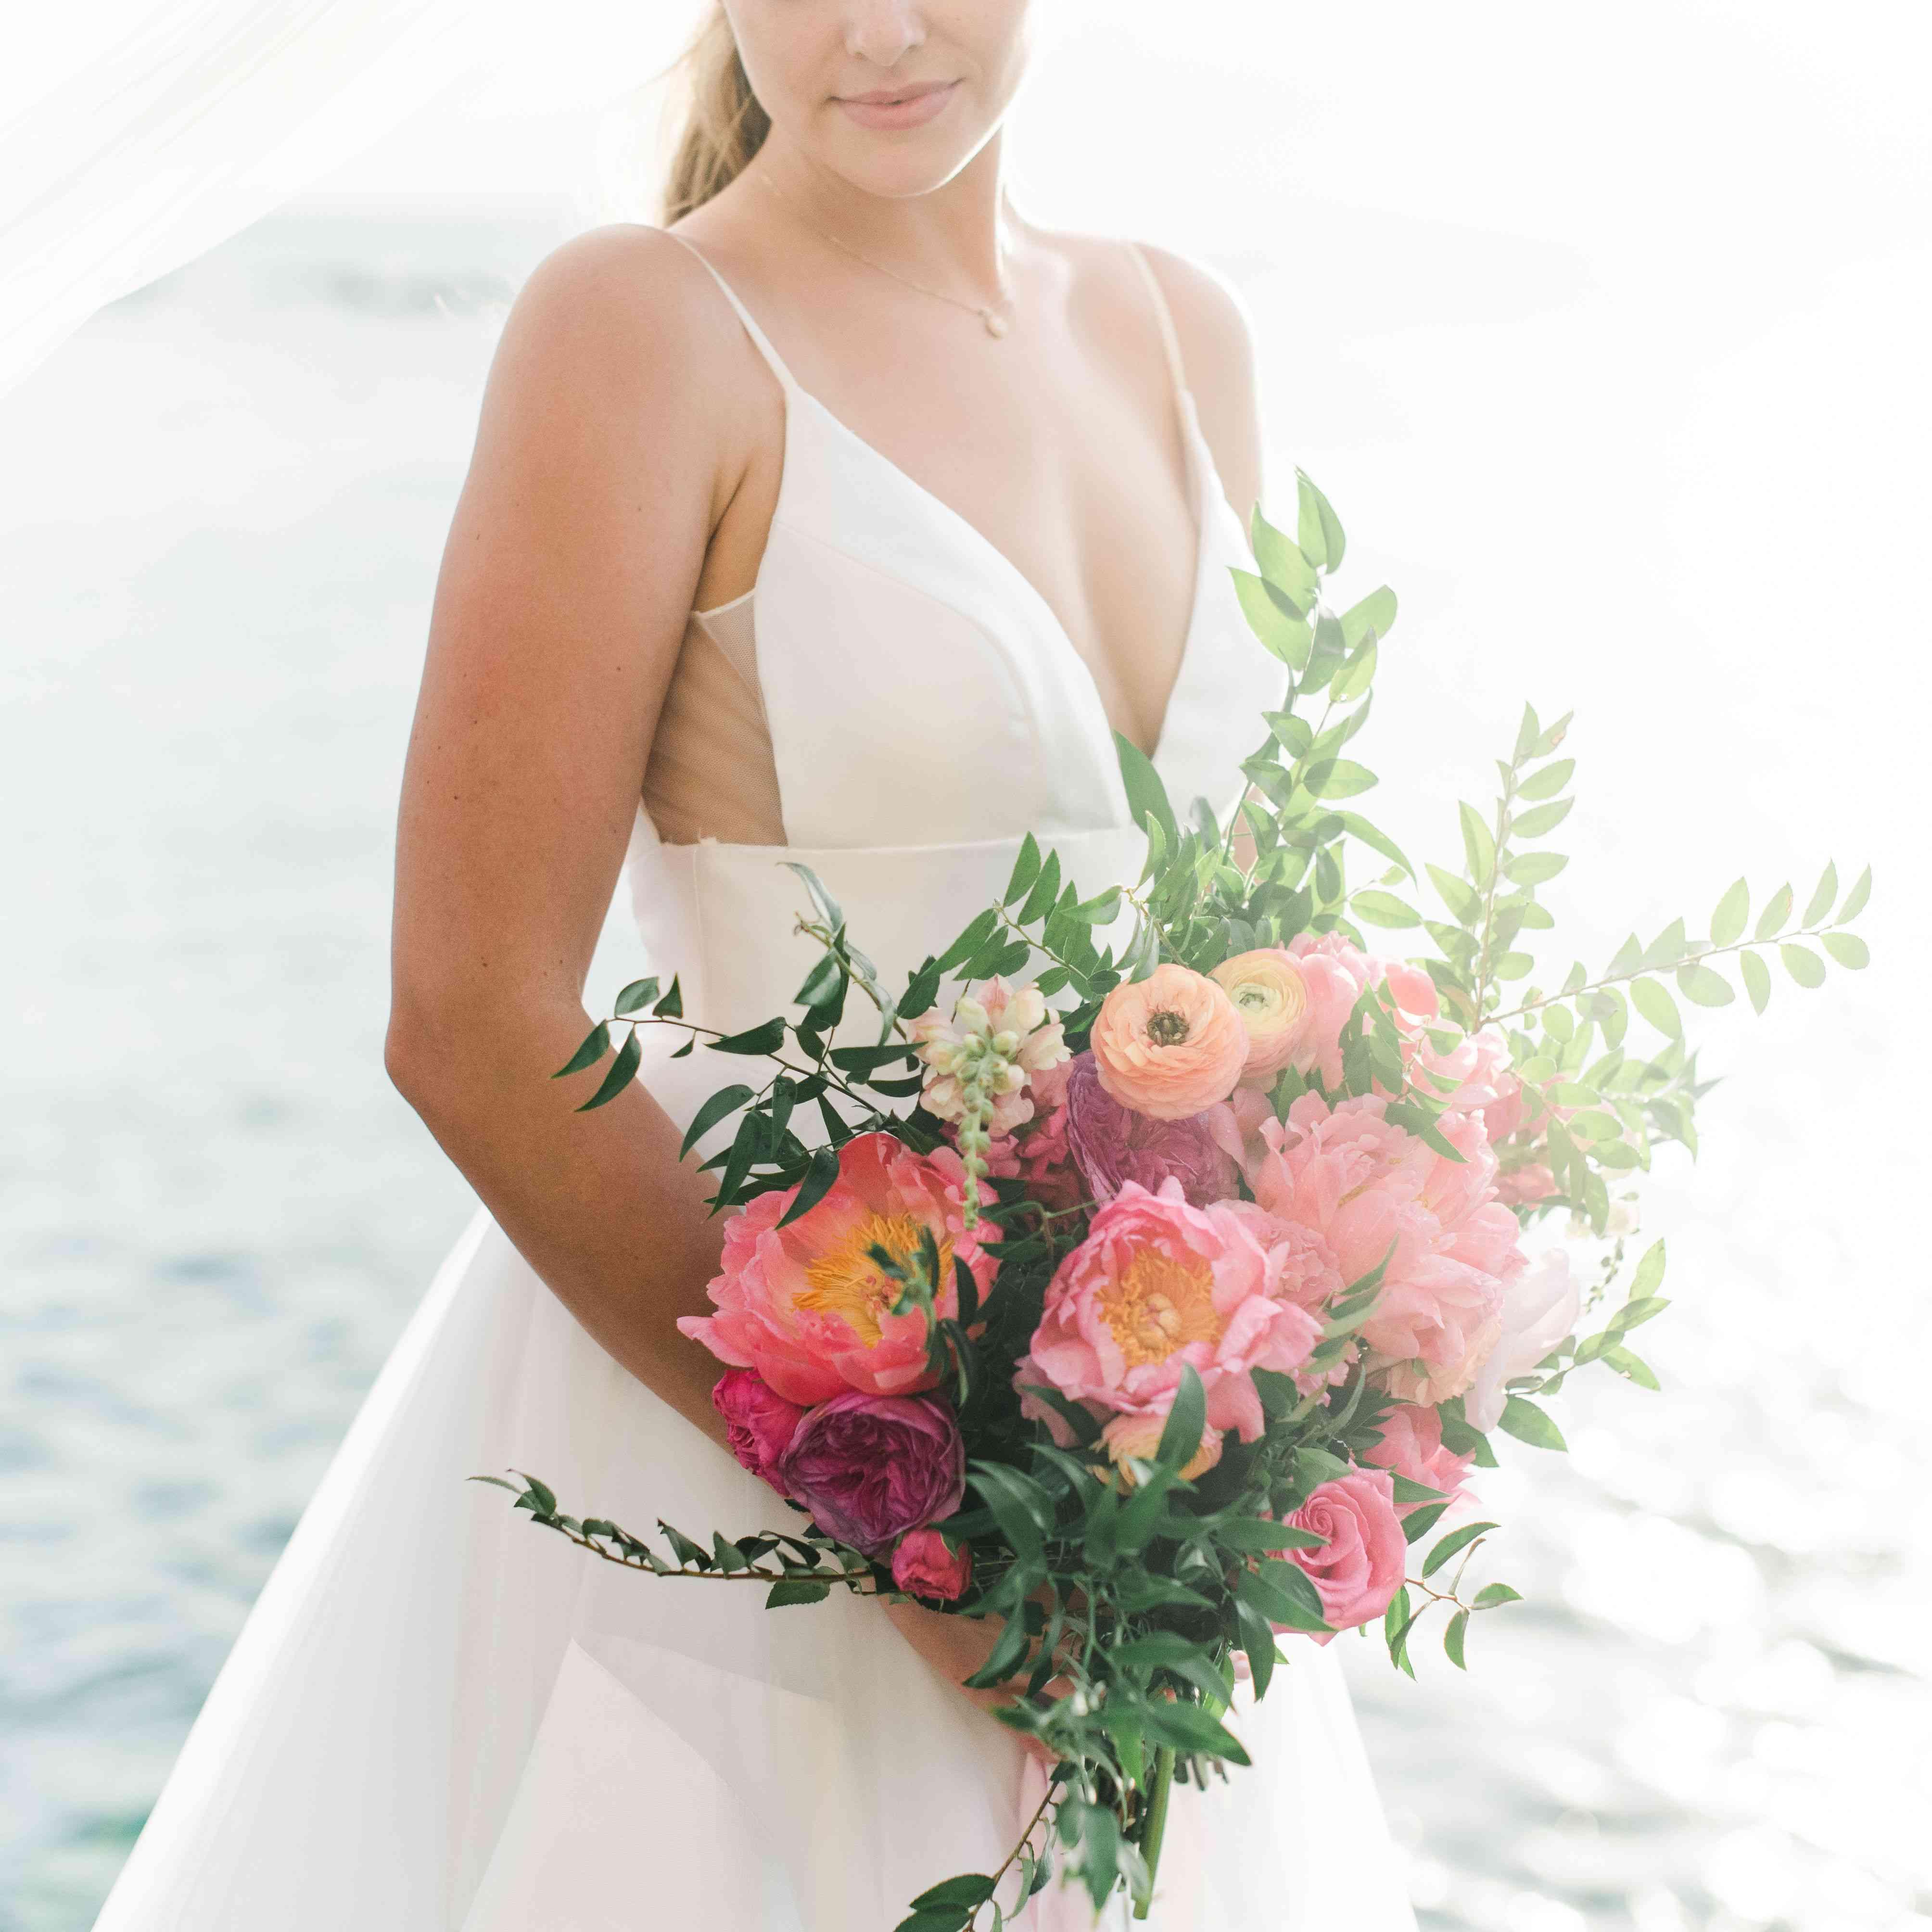 Bride with ombré eyeshadow